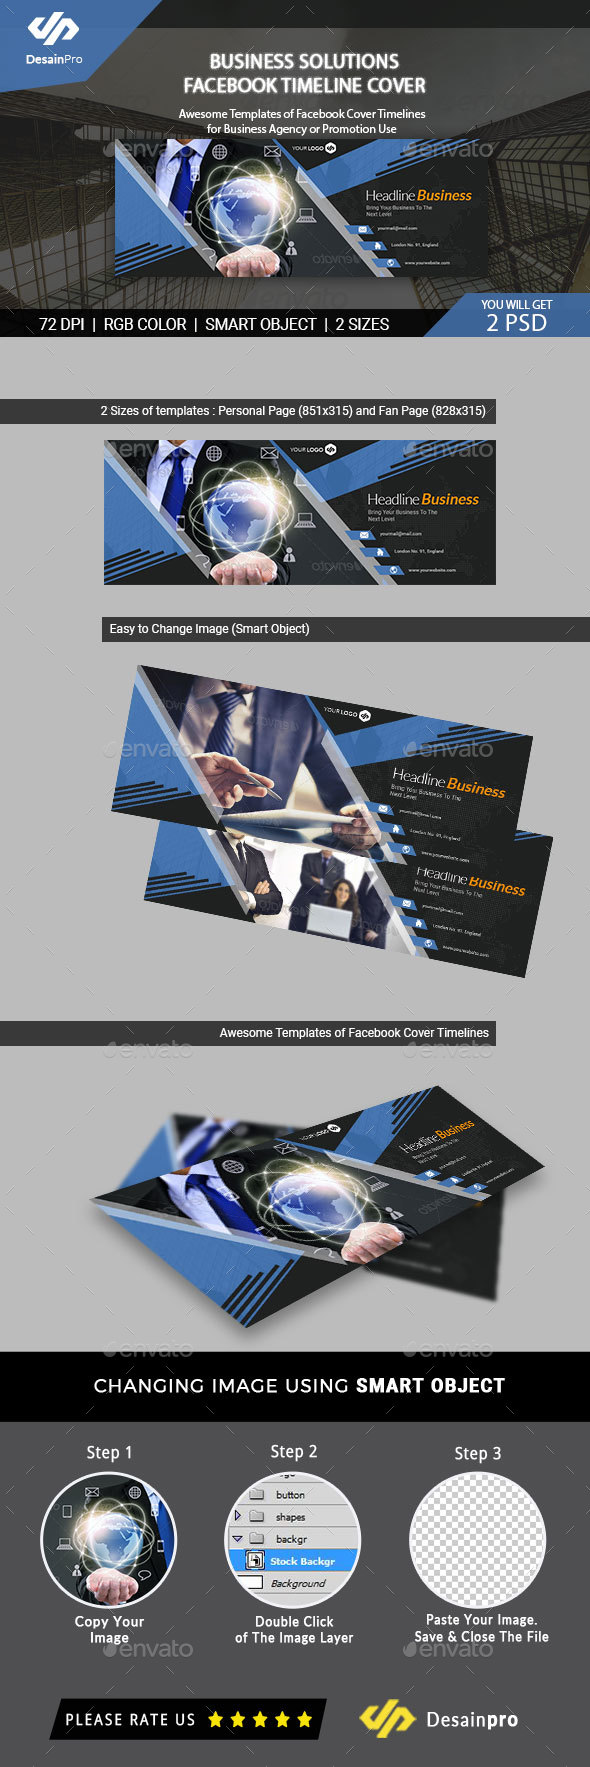 Business Services Facebook Timeline Cover - AR - Facebook Timeline Covers Social Media